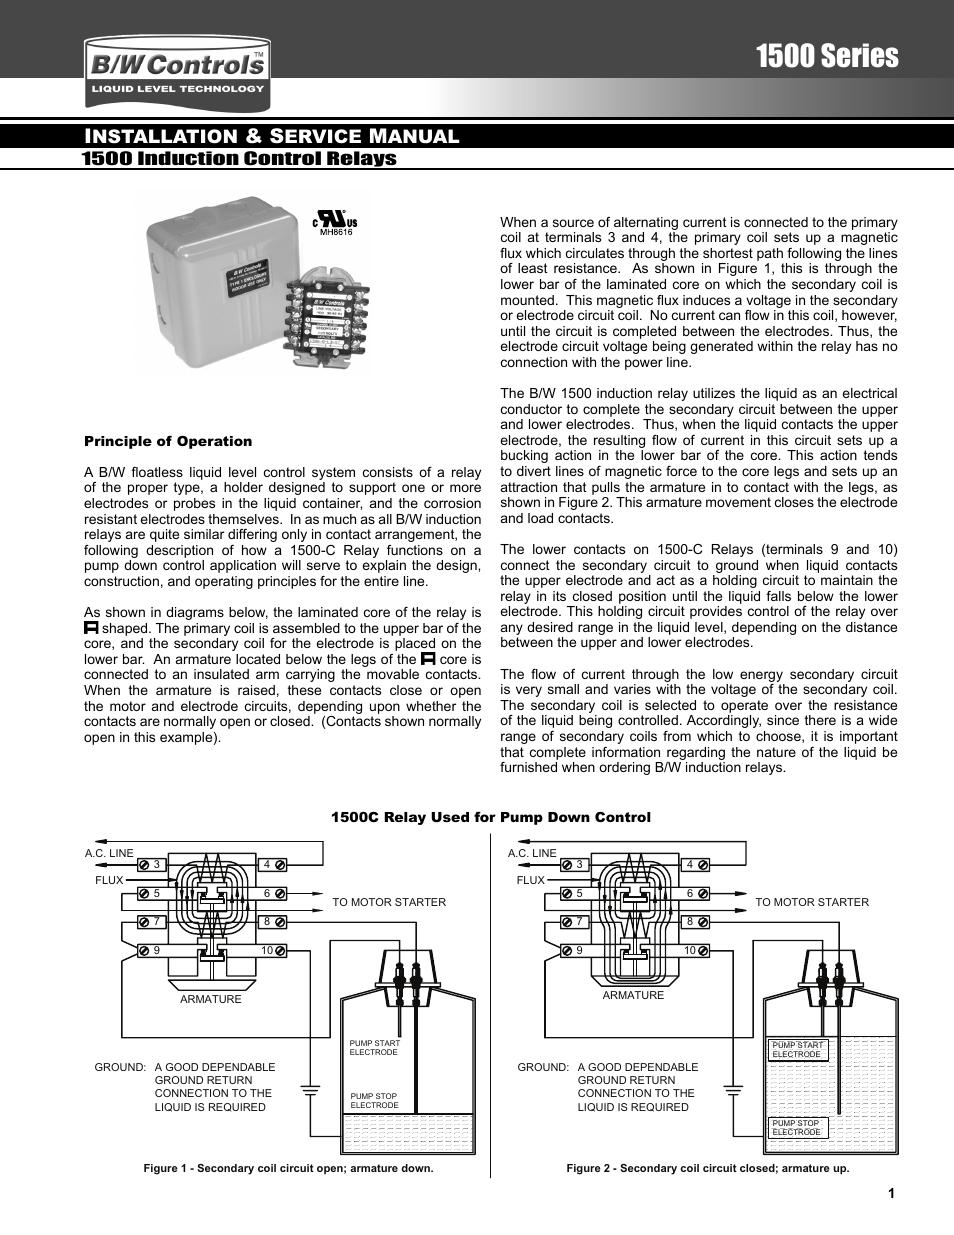 Ametek Time Delay Relay Wiring Diagram Ssac Alternating Magnificent Coils Vignette Best Images For